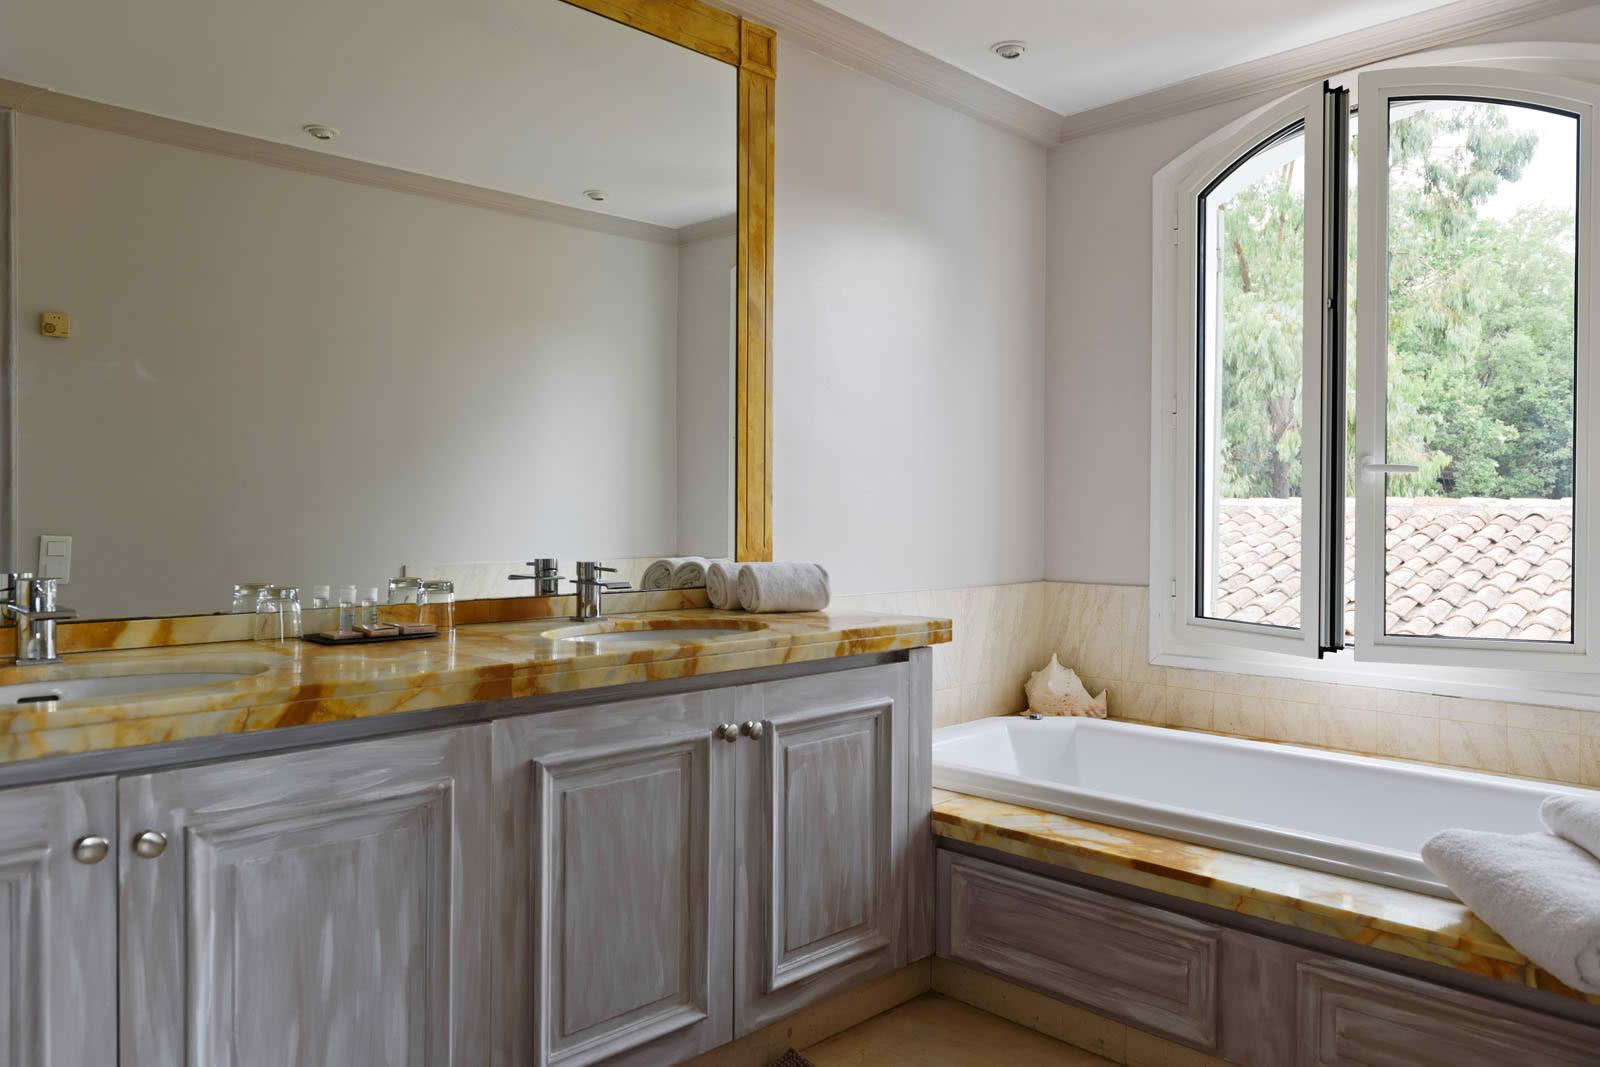 villa avec piscine louer ramatuelle 6 chambres grand jardin terrasses studio et 2. Black Bedroom Furniture Sets. Home Design Ideas